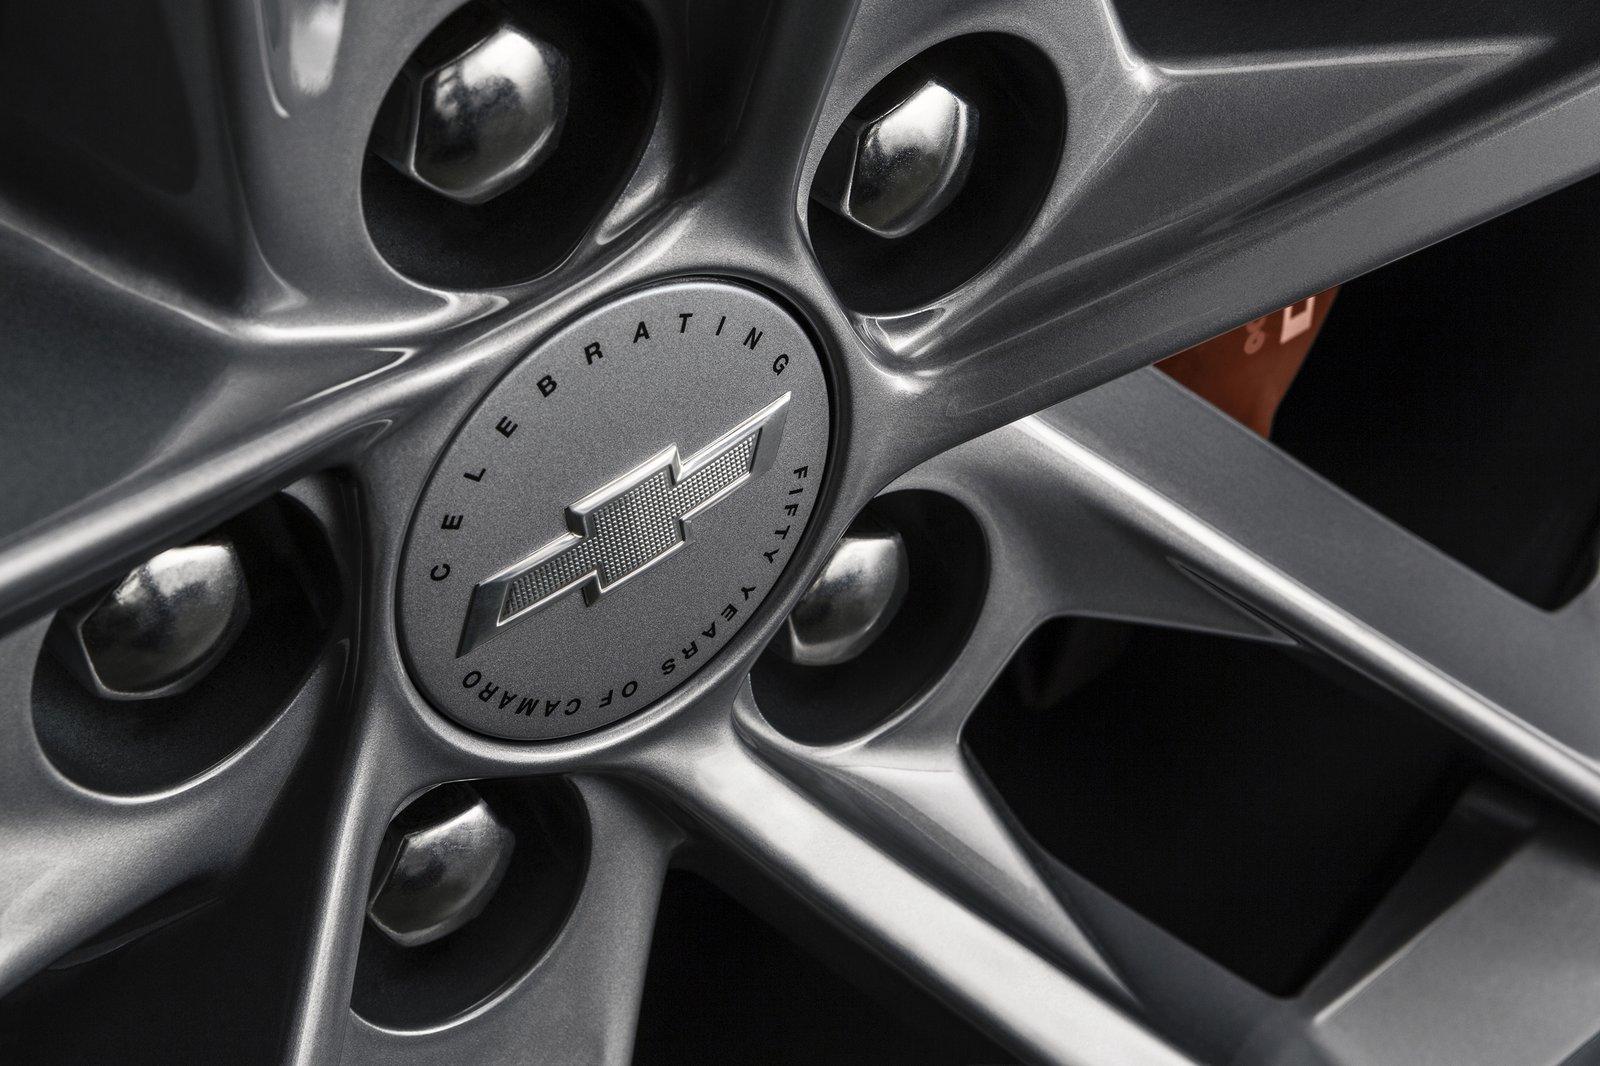 Chevrolet Сamaro 50th Anniversary Edition